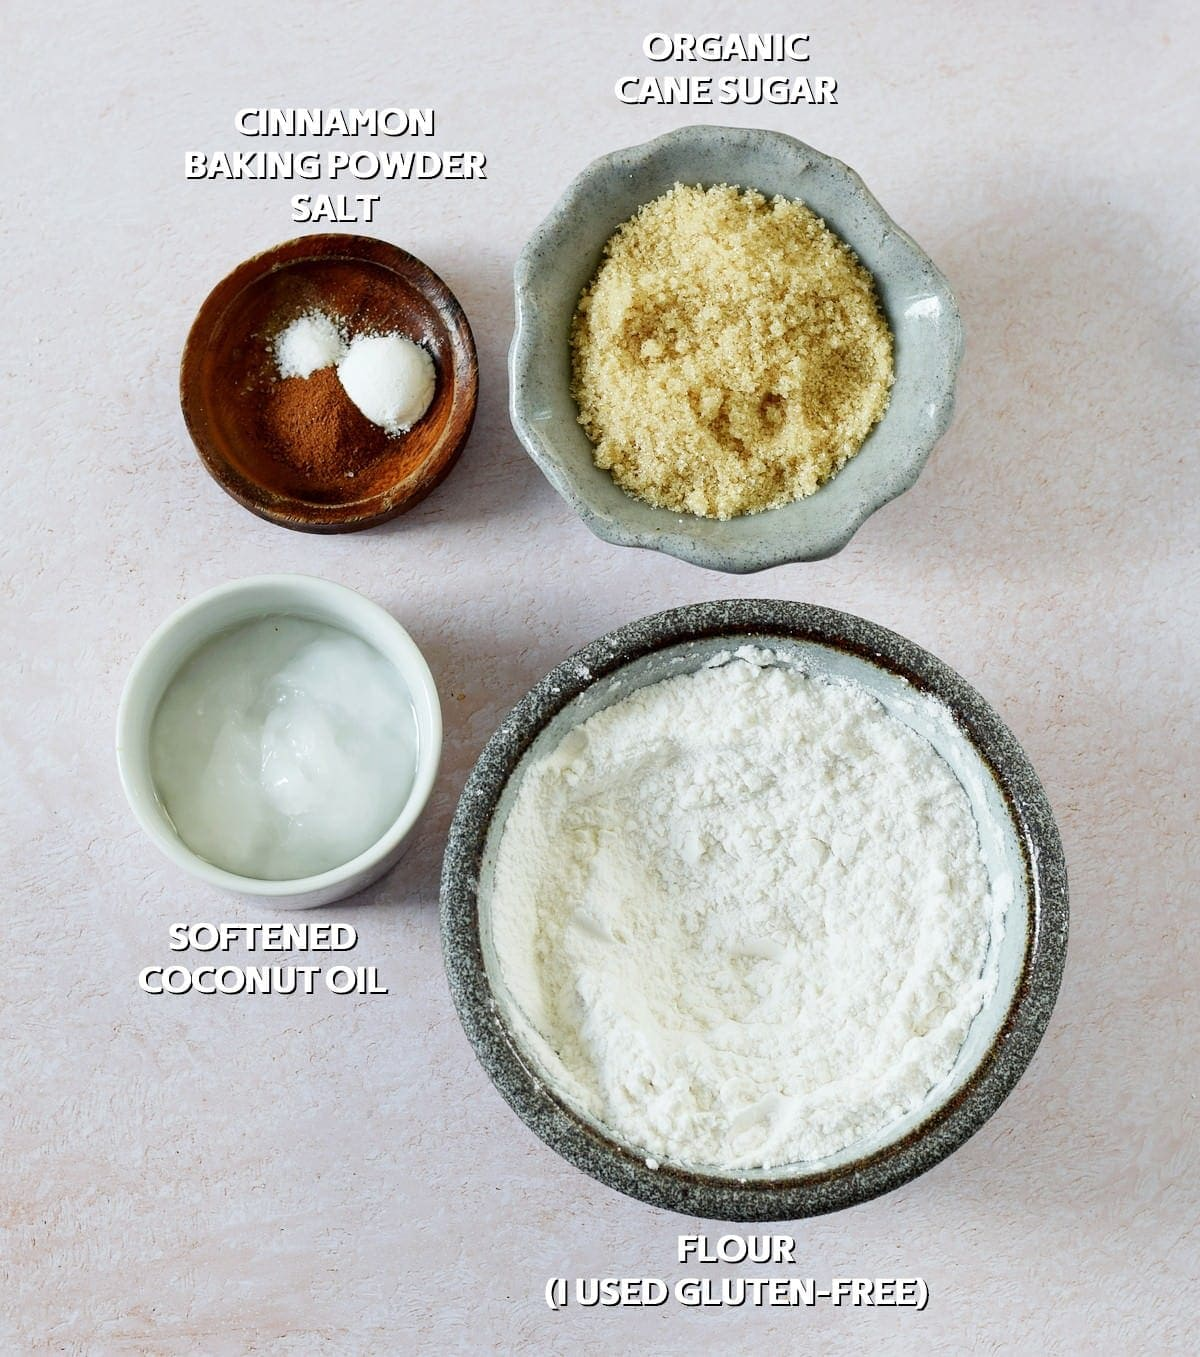 Vegan Crumble ingredients